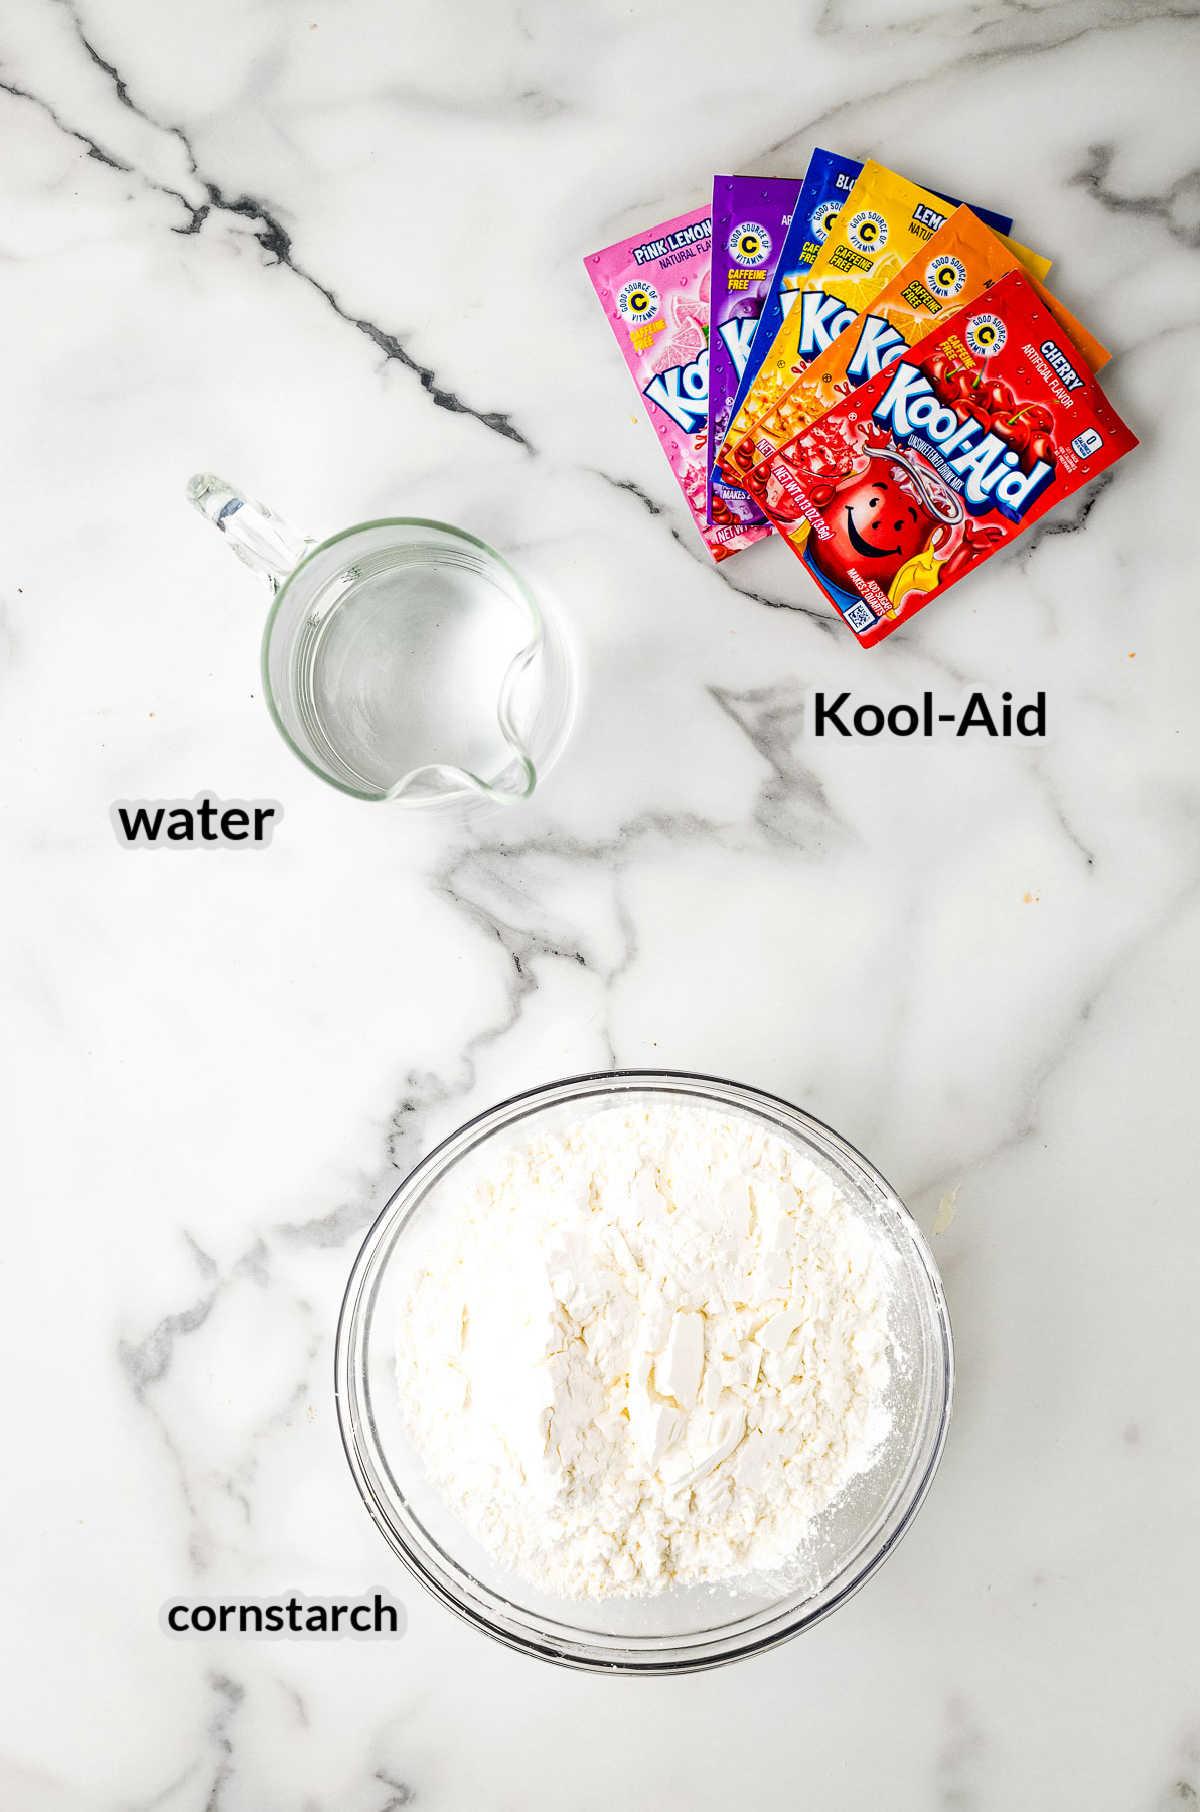 Overhead Image of Kool-Aid Oobleck Ingredients copy